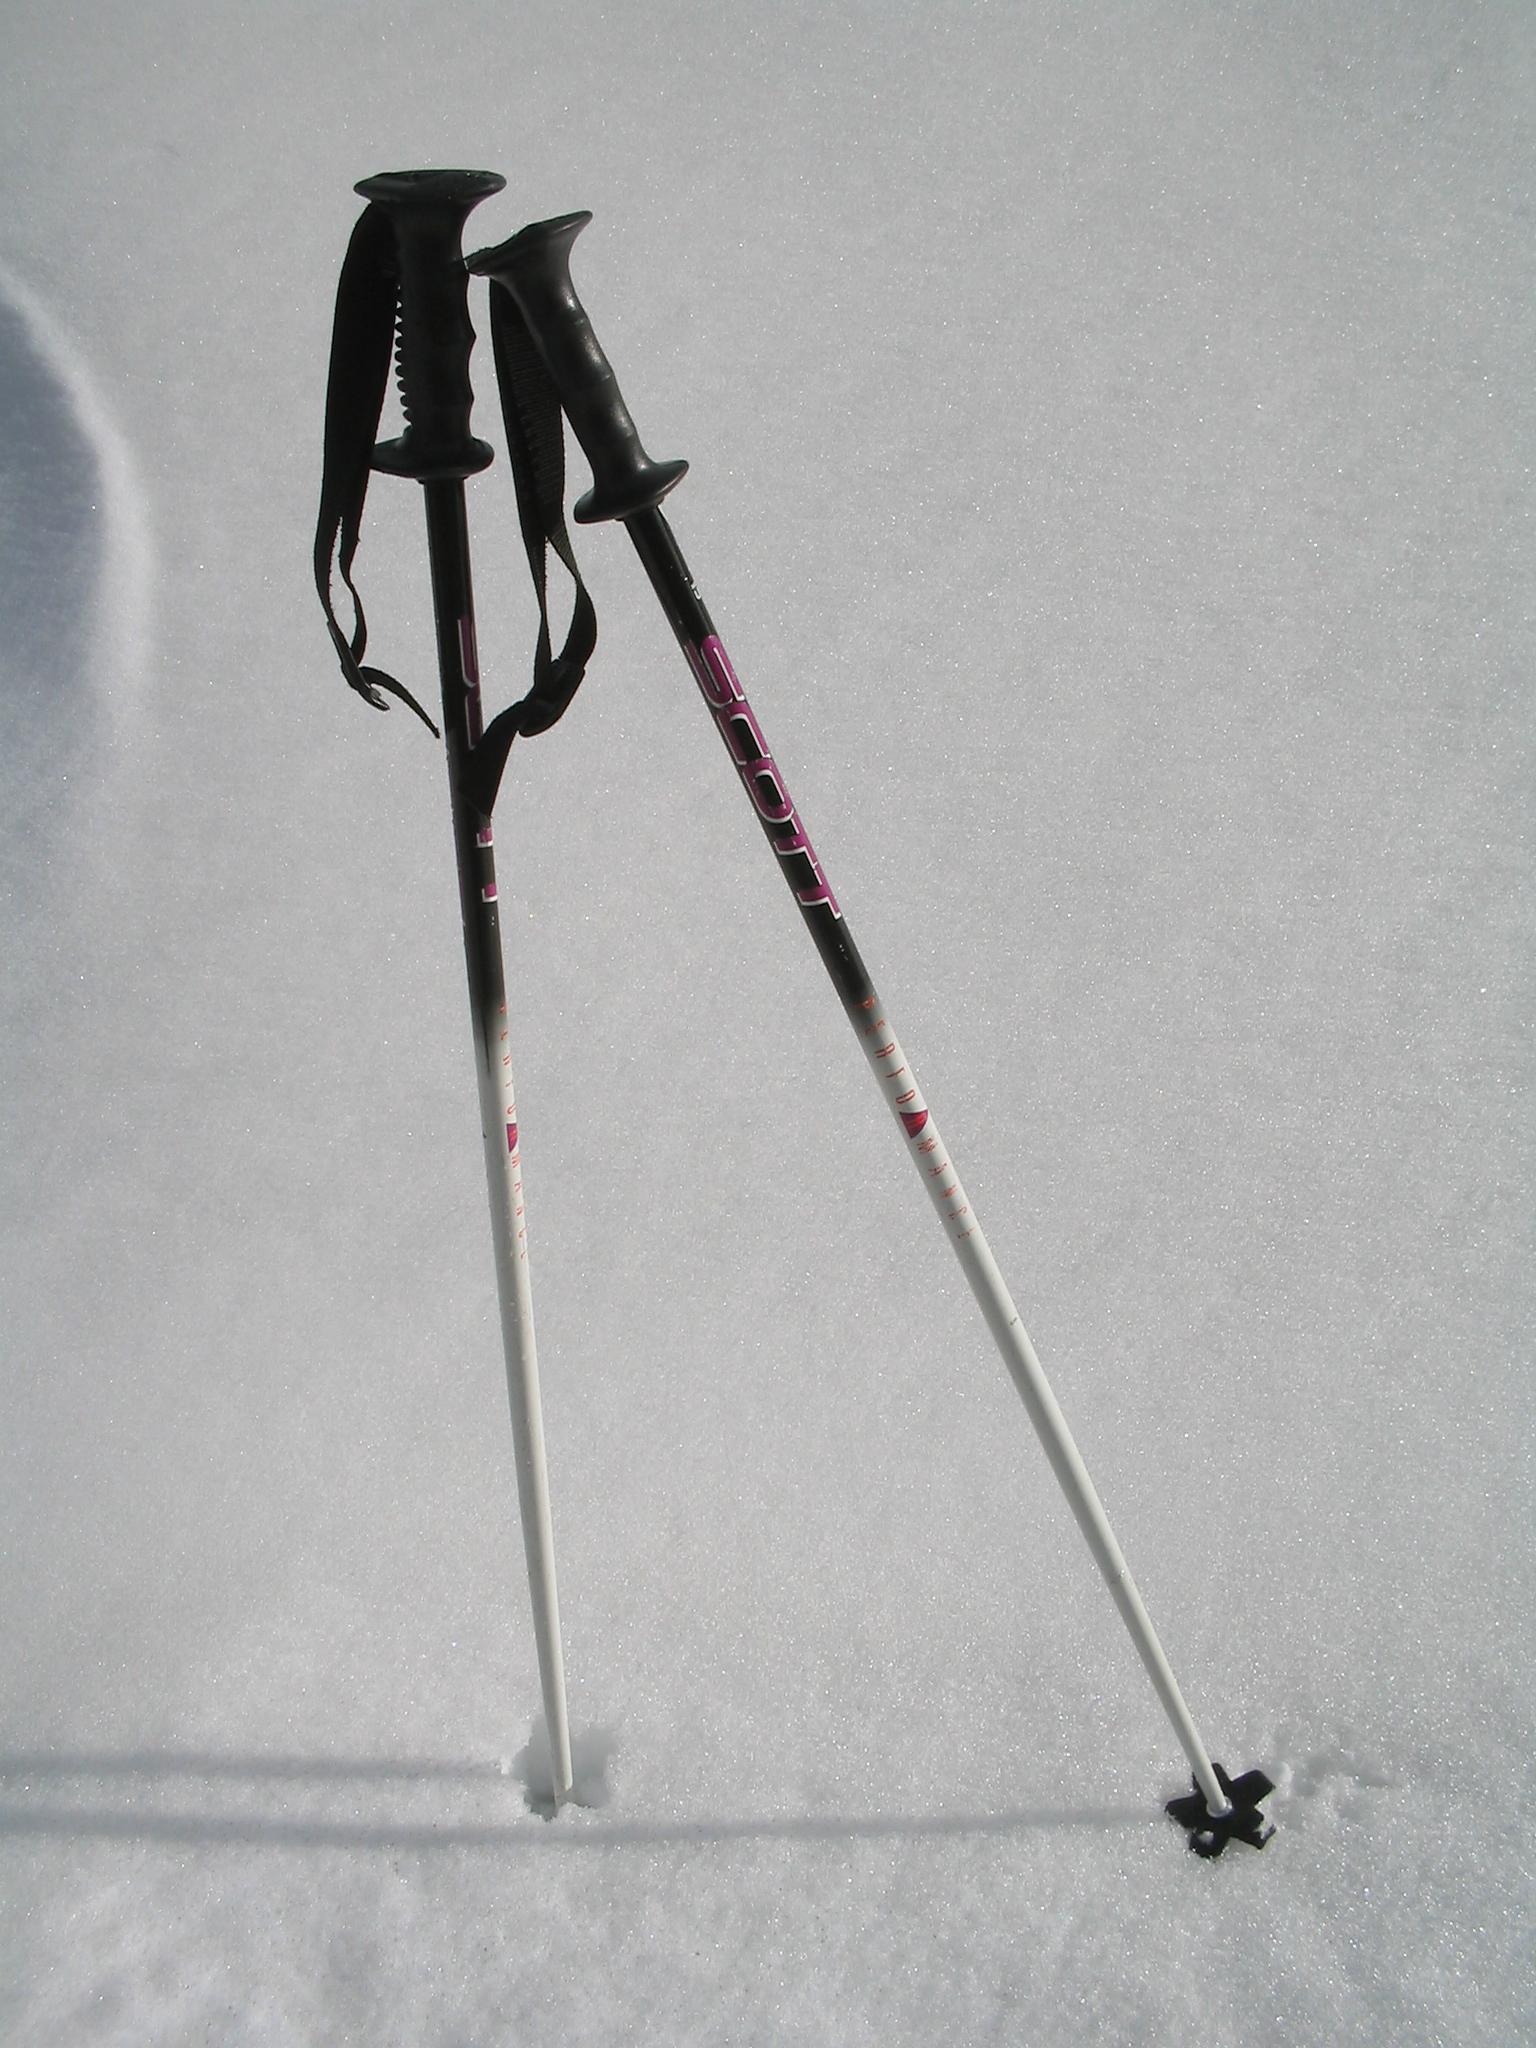 Ski_poles wiki